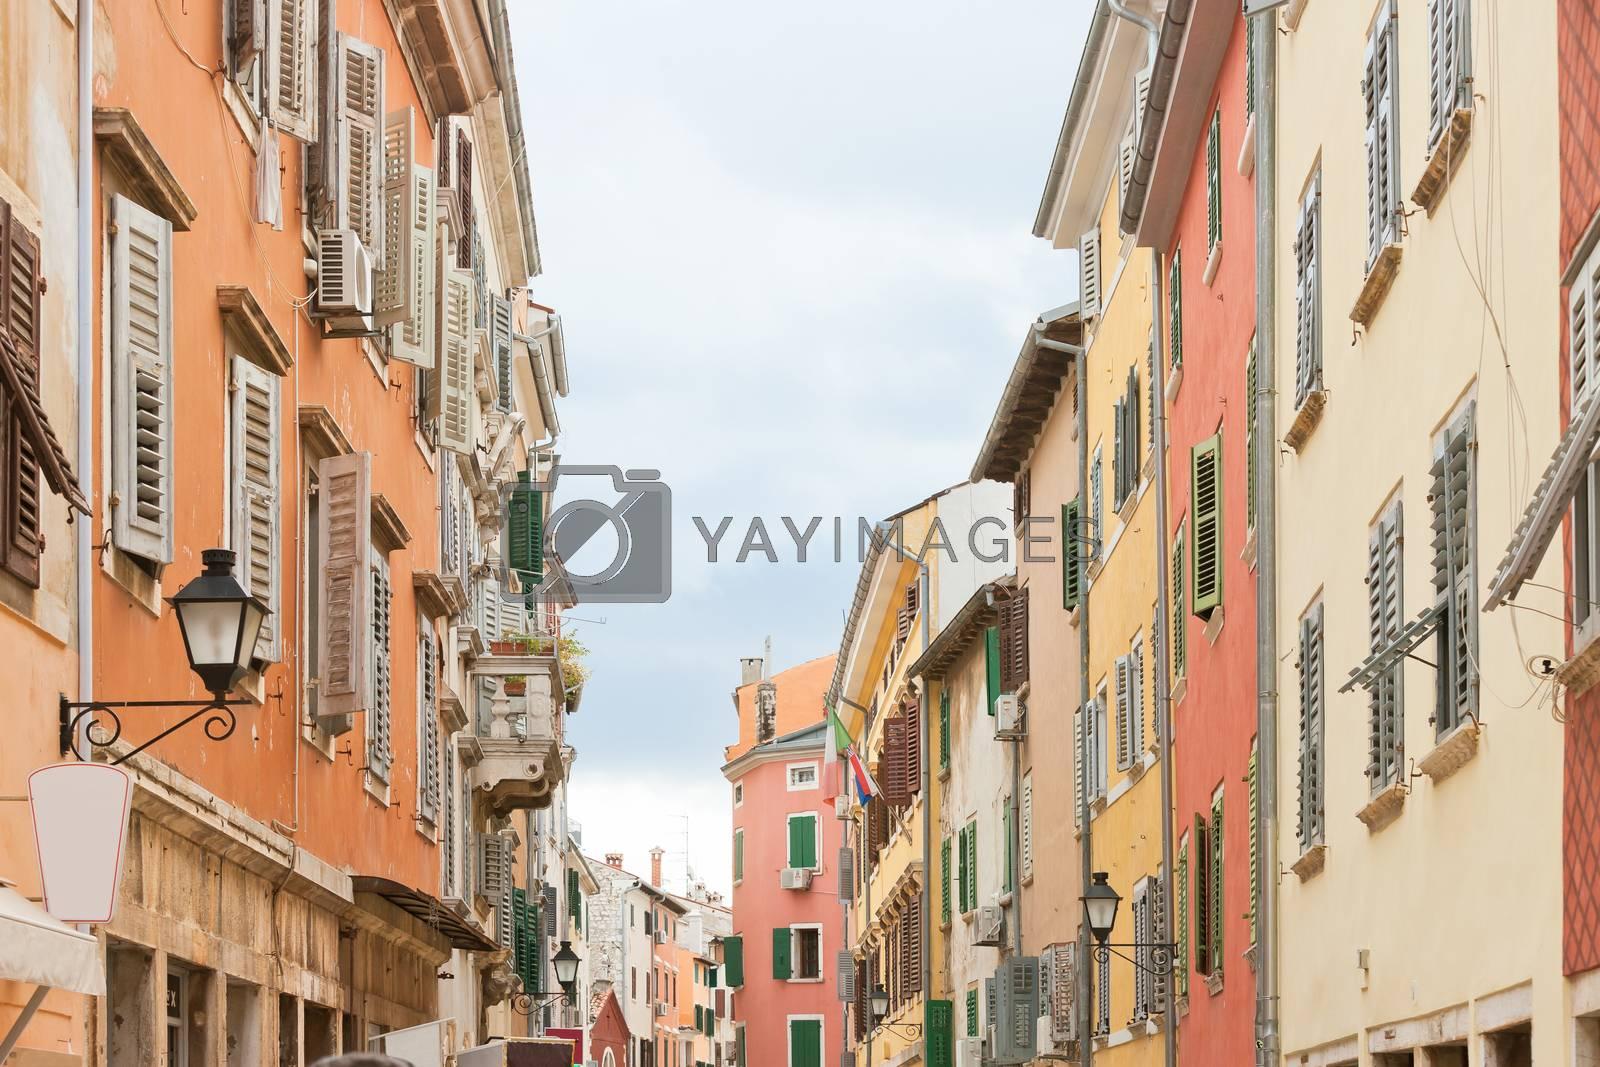 Rovinj, Istria, Croatia, Europe - Historic houses in the old town of Rovinj